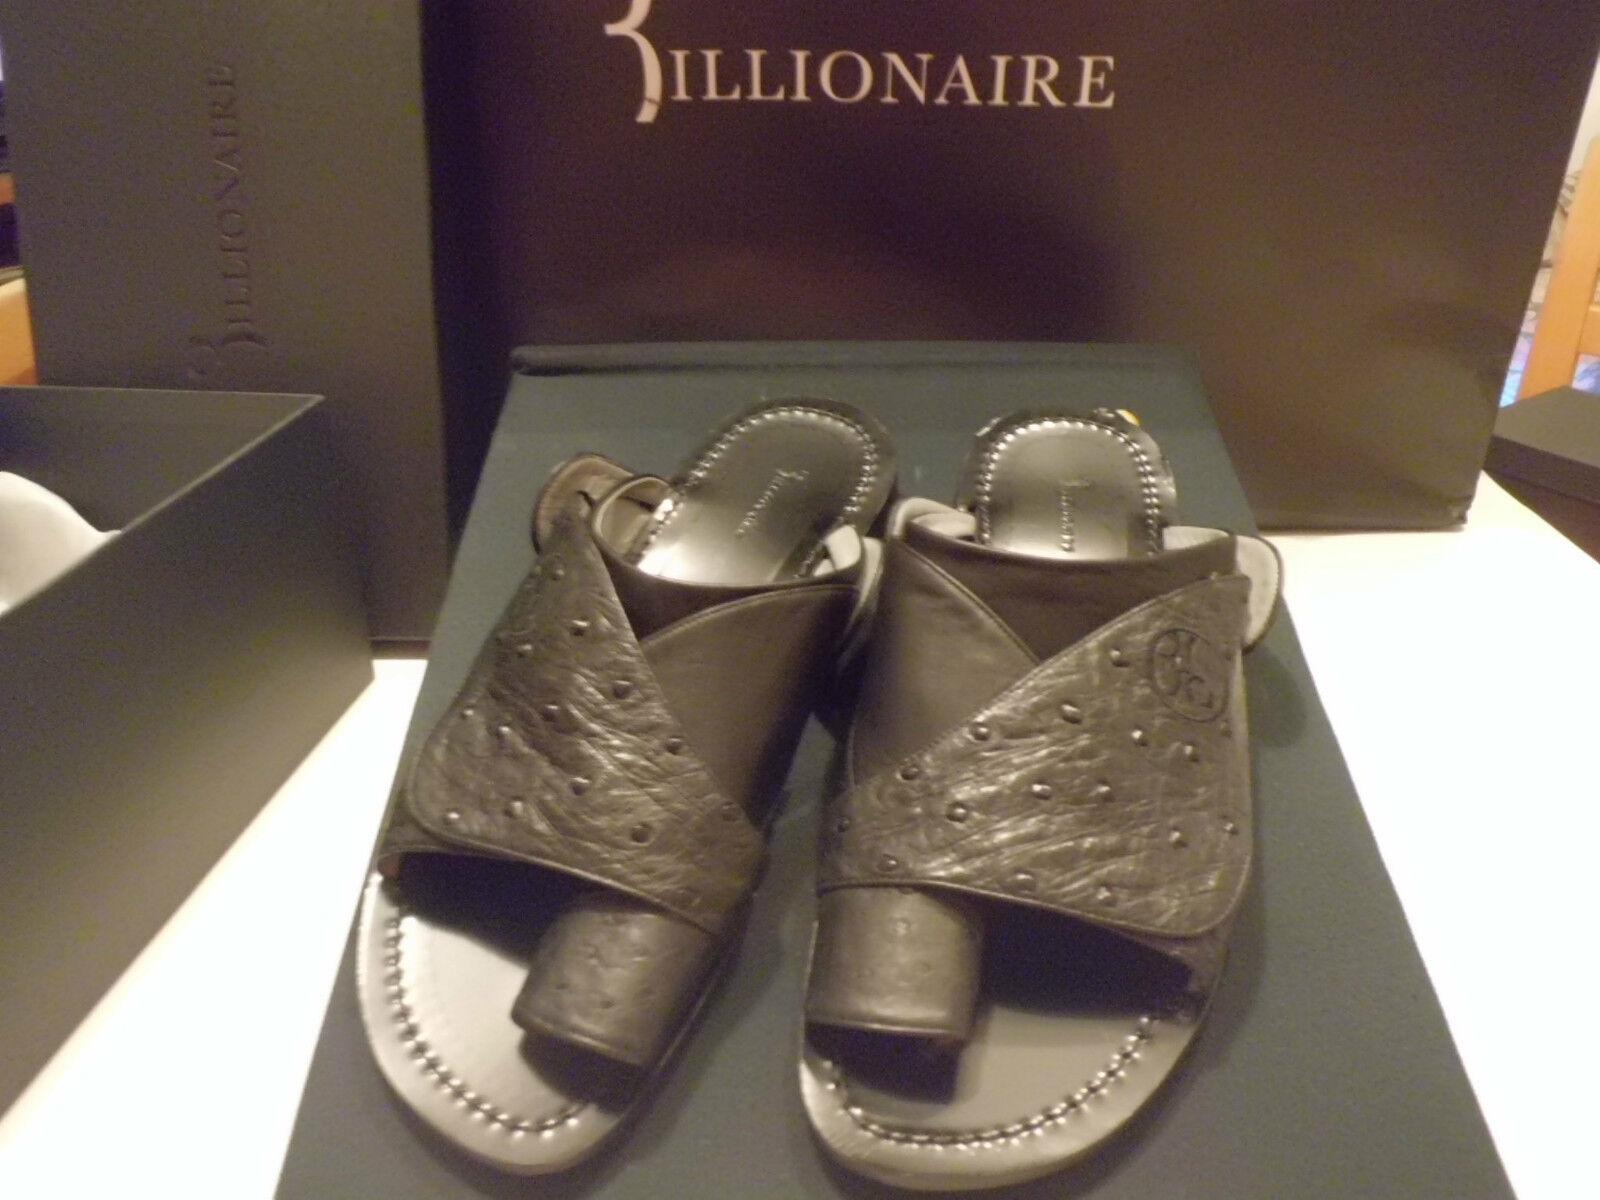 BILLIONAIRE Italian Couture Sandali Pelle  /  Ostrich   size  1230,00